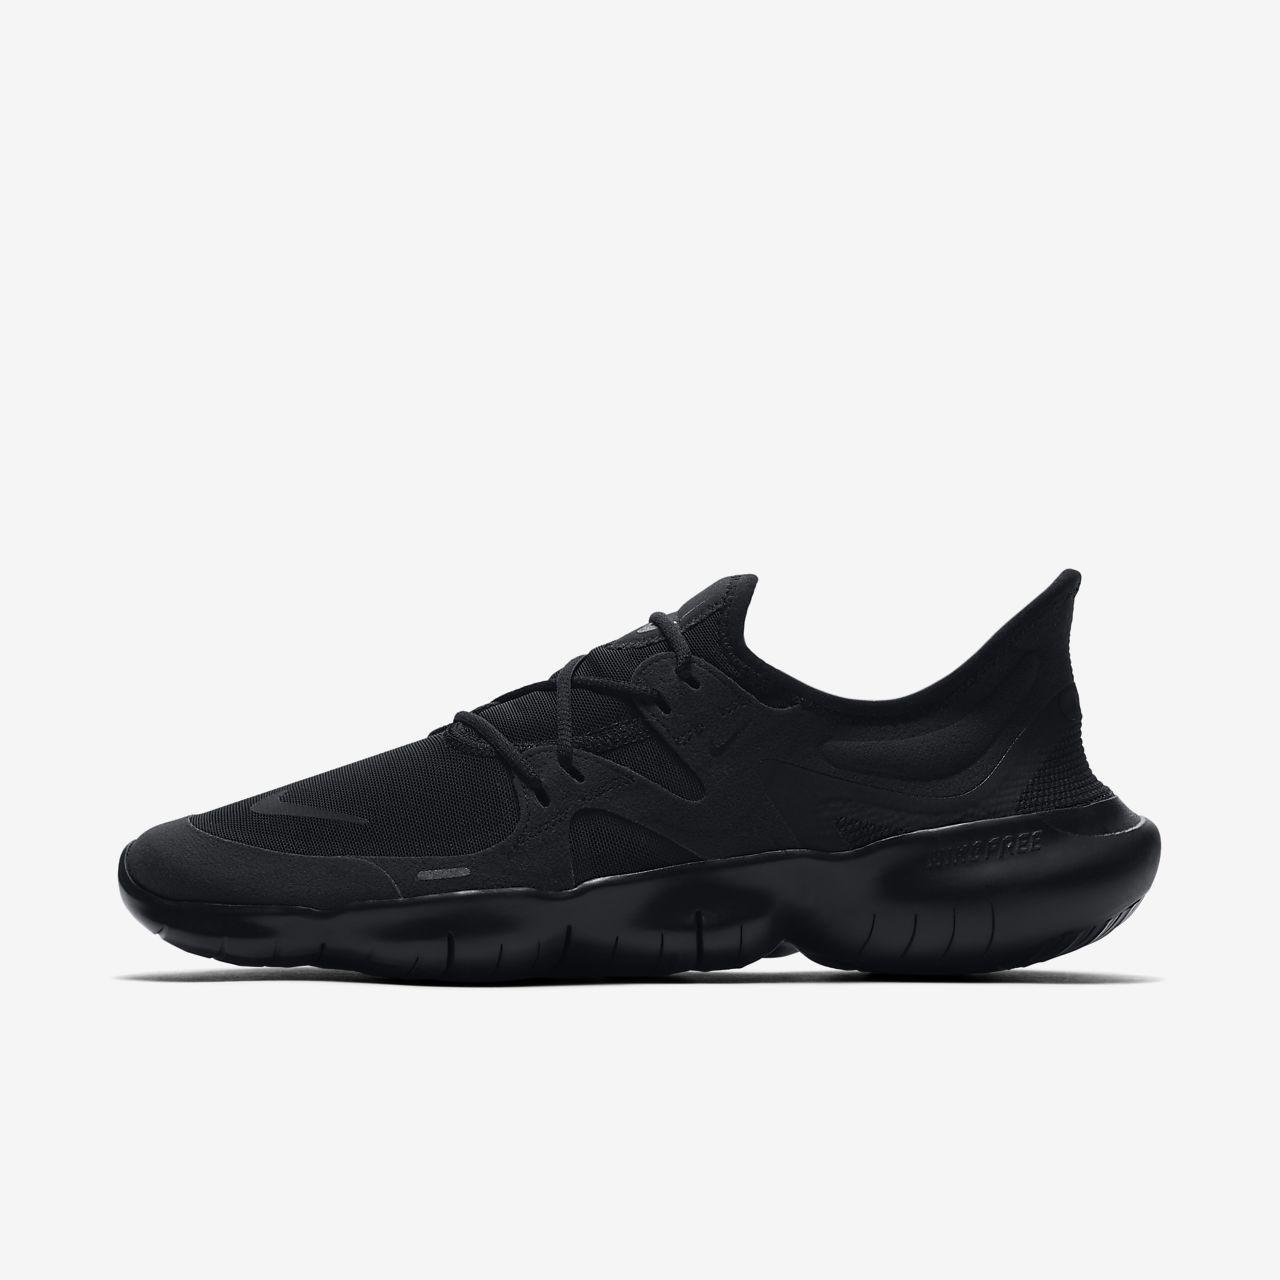 380958c5a2ad4 Nike Free RN 5.0 Men's Running Shoe. Nike.com